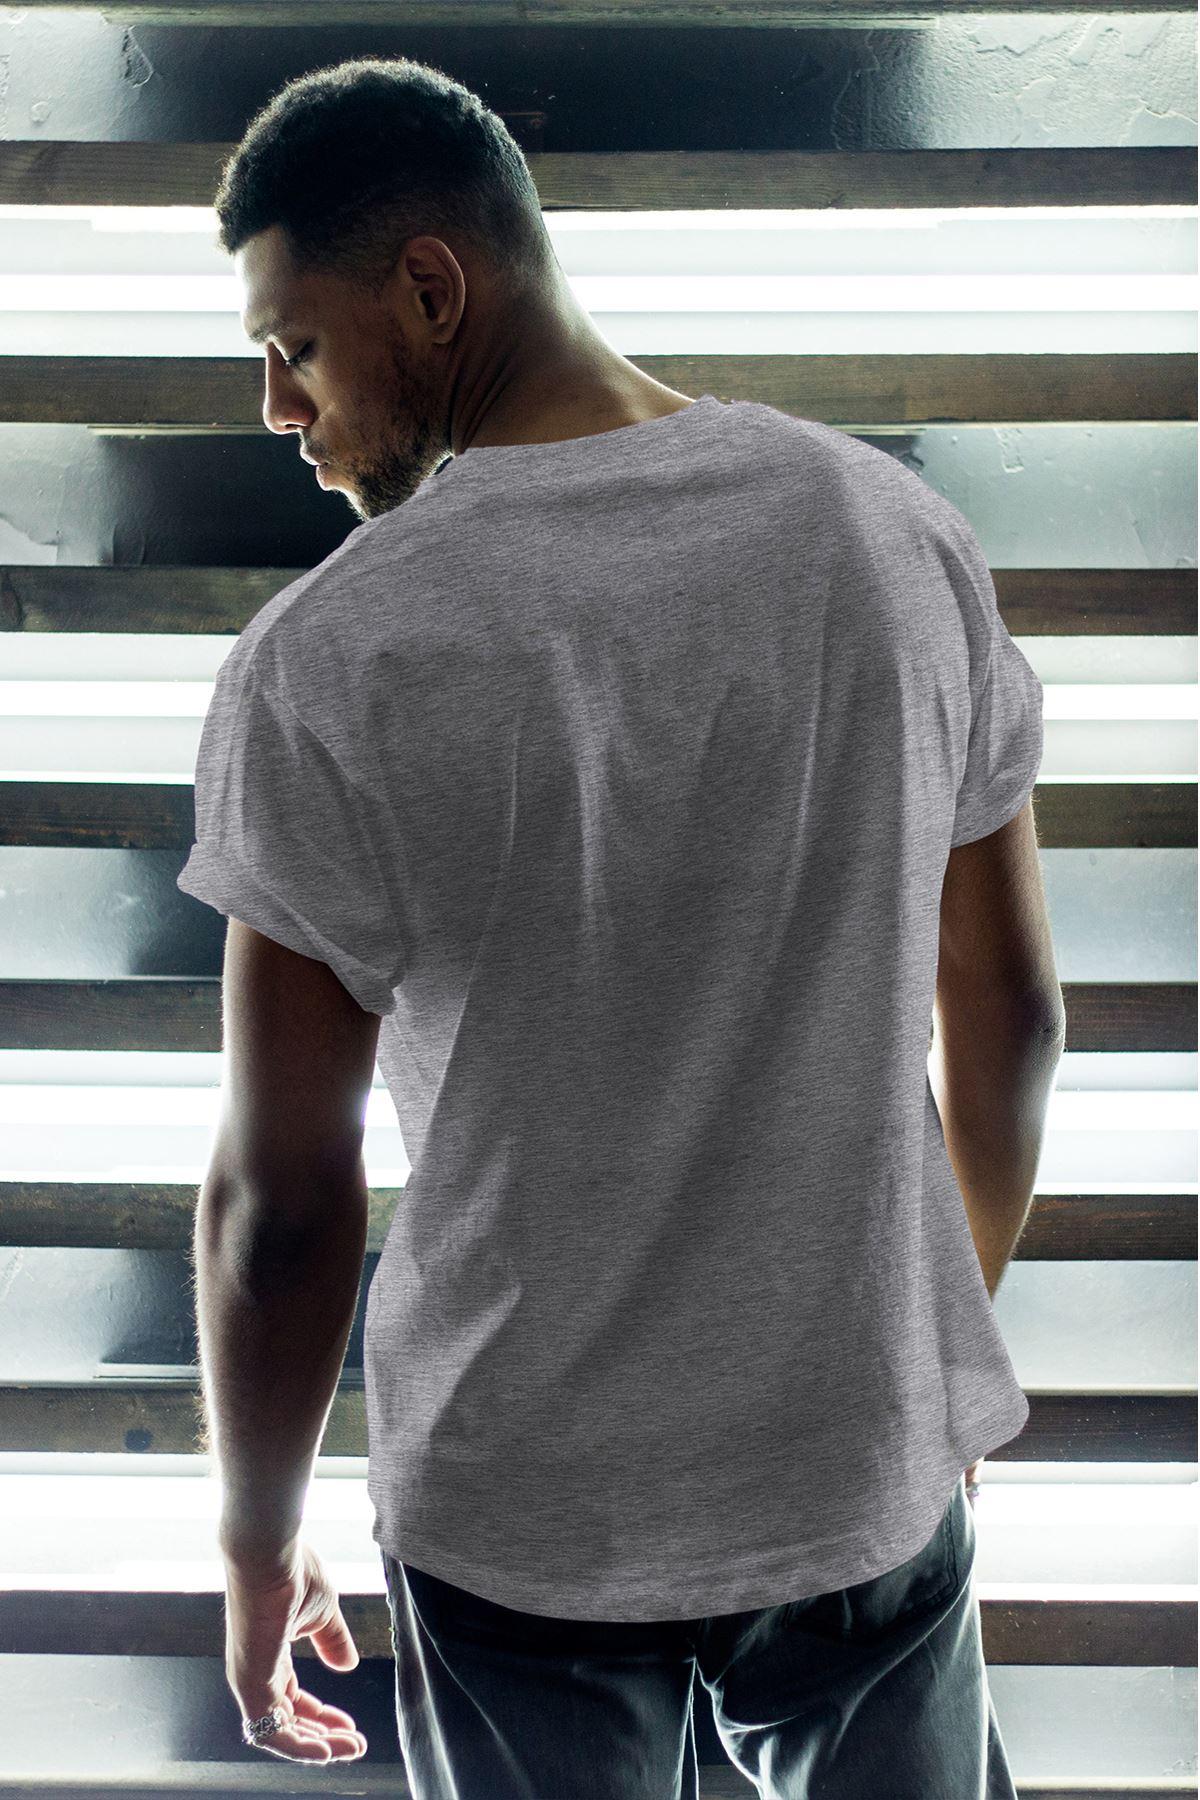 Chicago Bulls 36 Gri Erkek Oversize Tshirt - Tişört